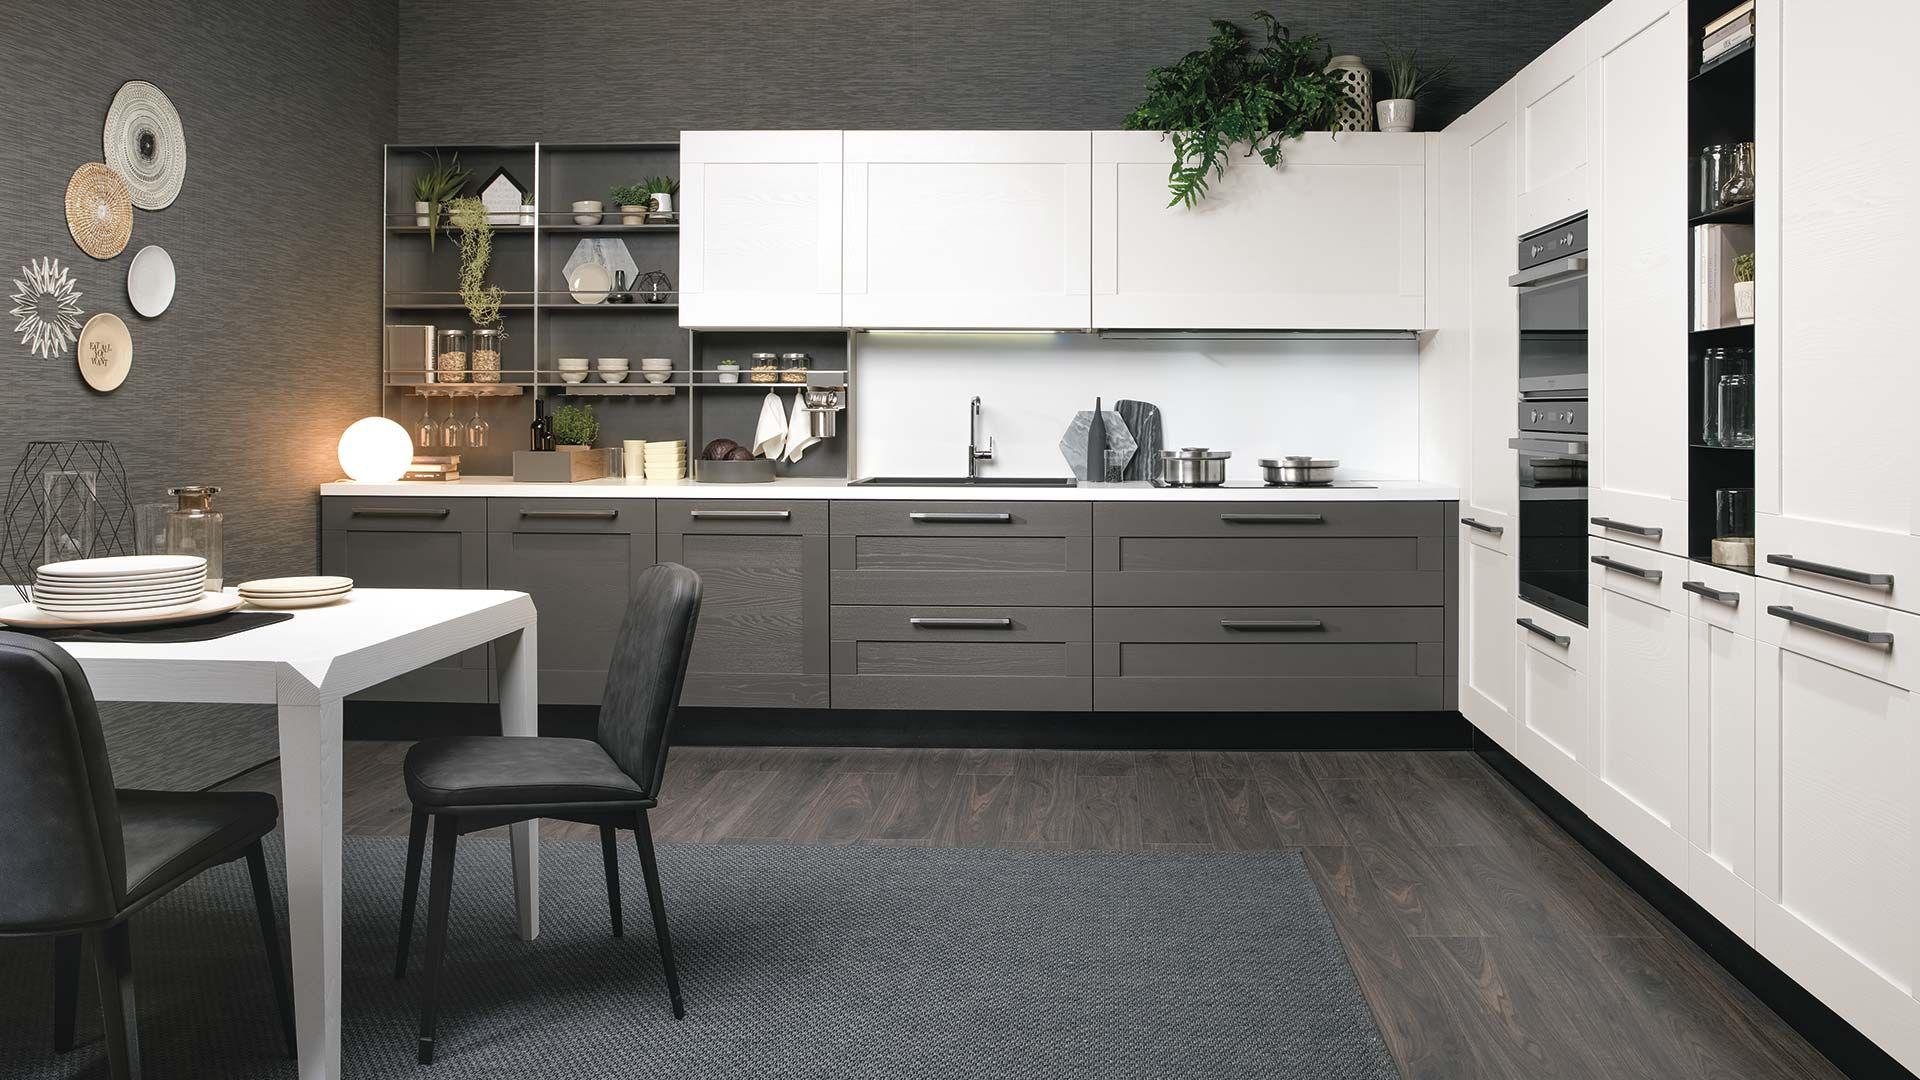 Gallery - Cucine Moderne - Cucine Lube   Κουζίνα, 2018   Pinterest